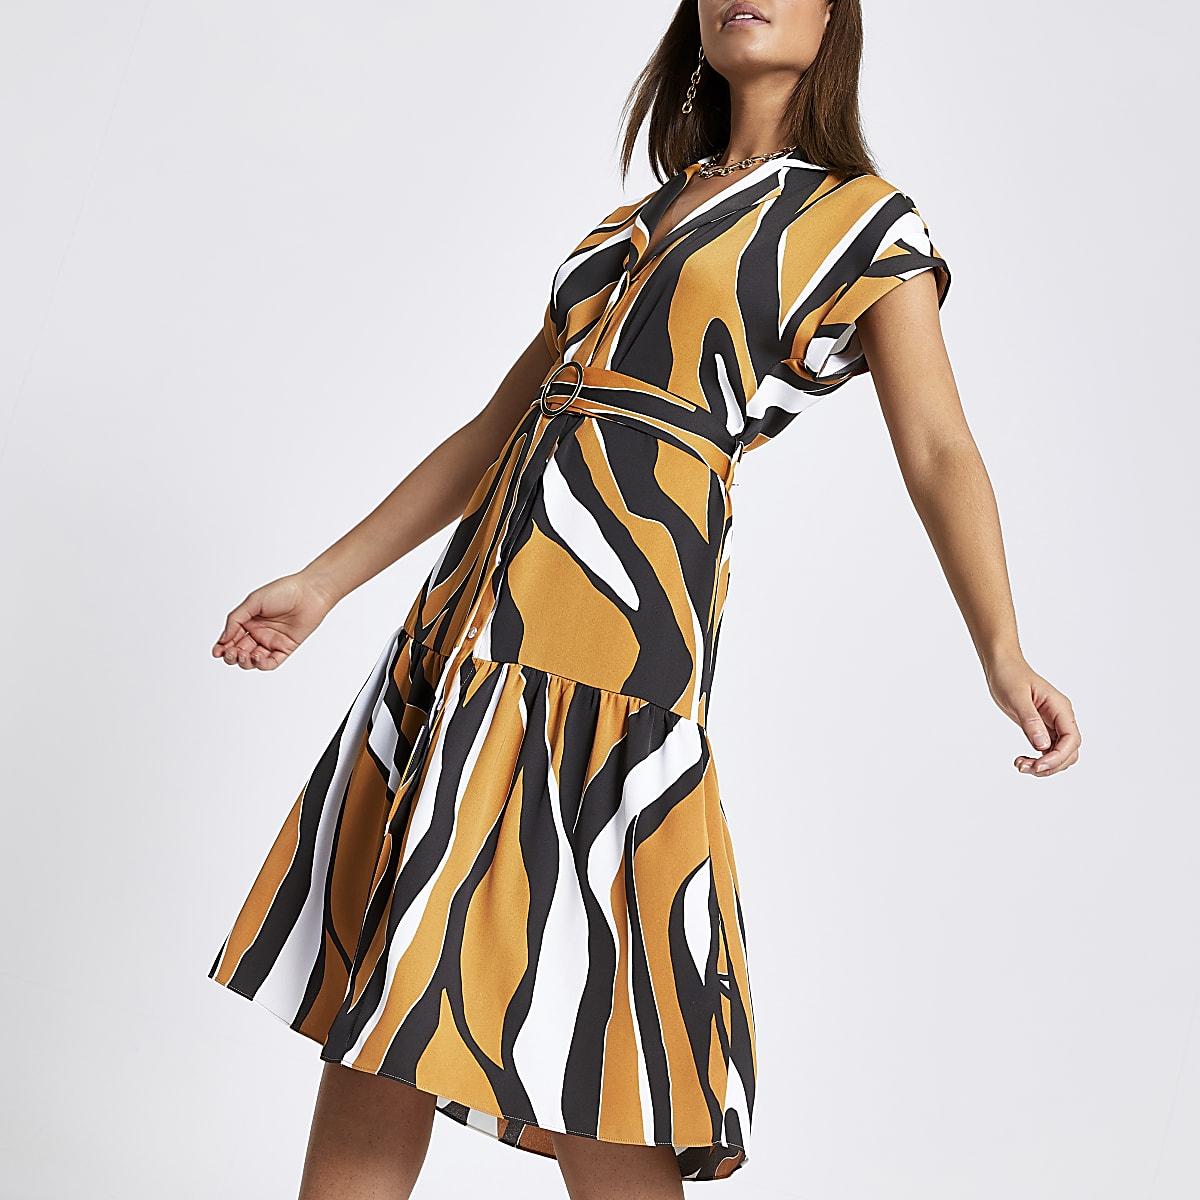 Beige zebra print midi shirt dress